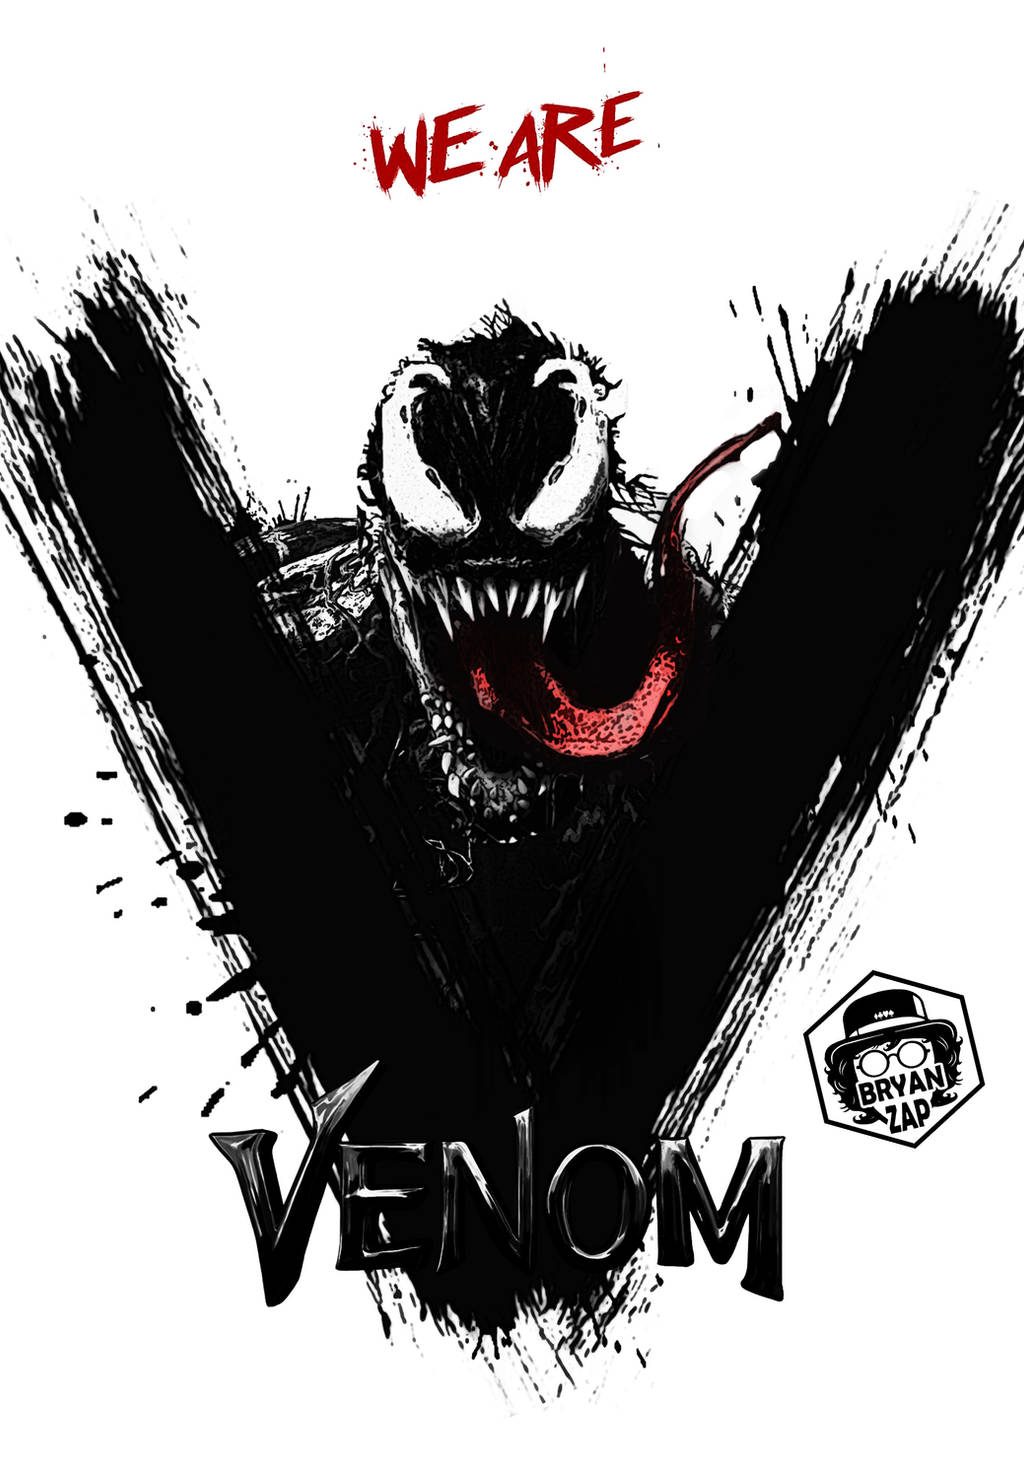 Venom Art by Bryanzap